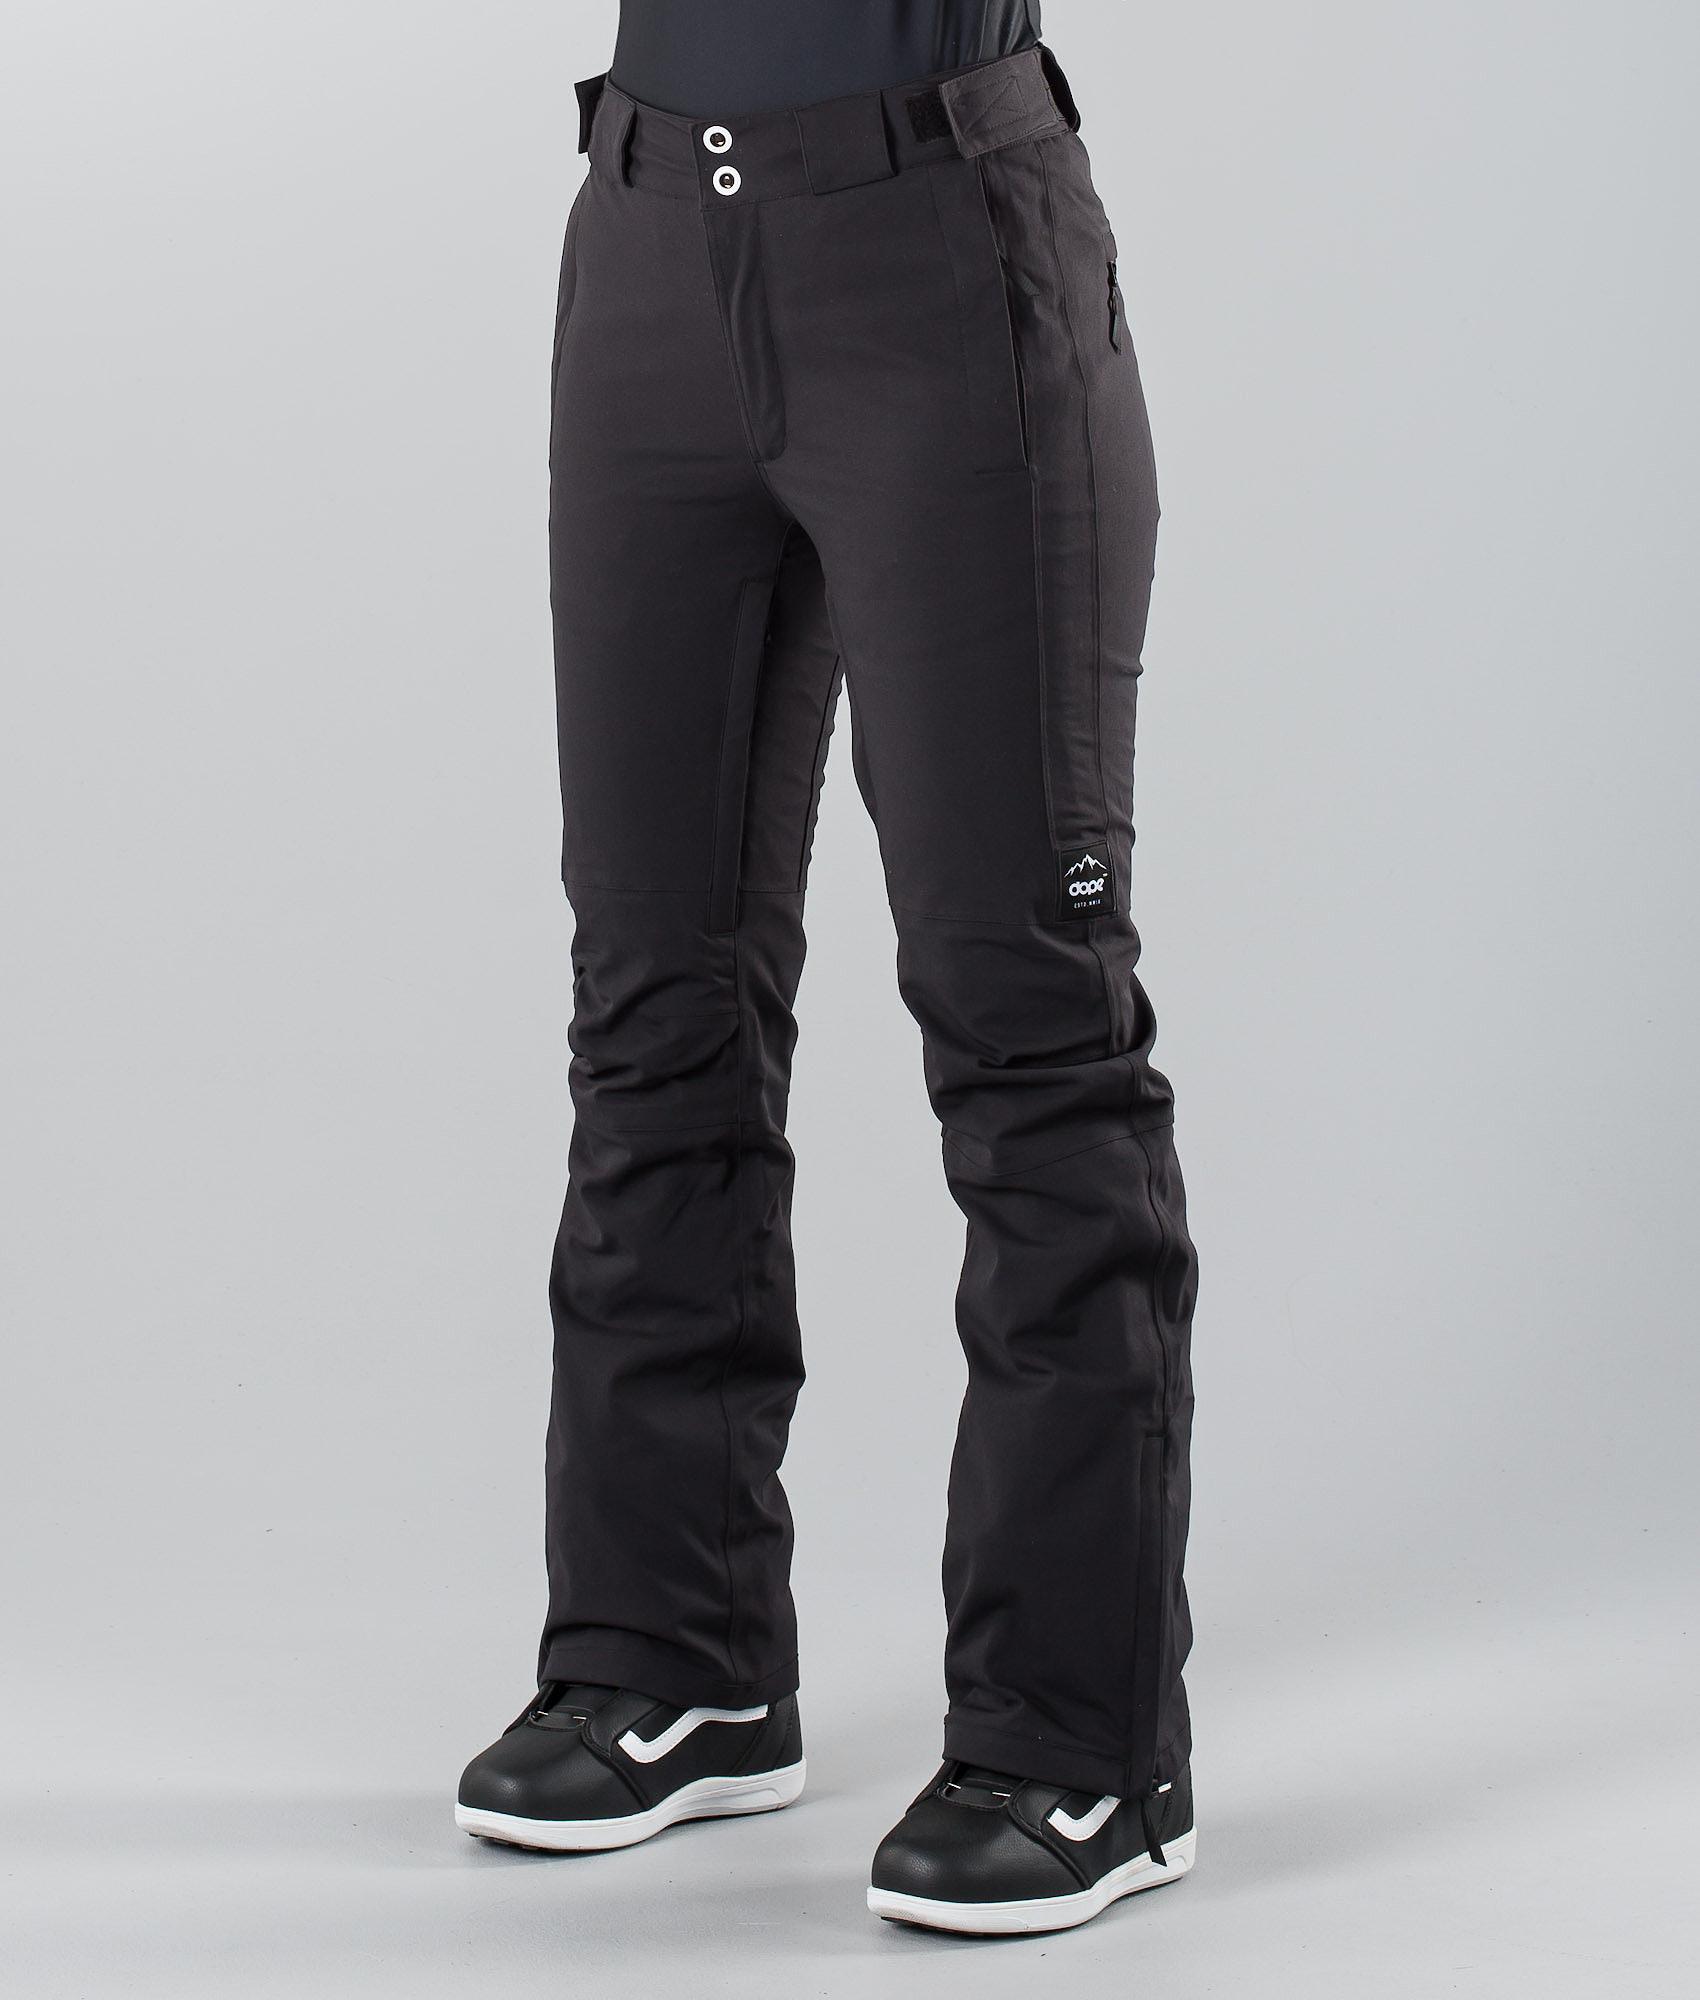 abba61695fc9 Women s Snowboard Pants